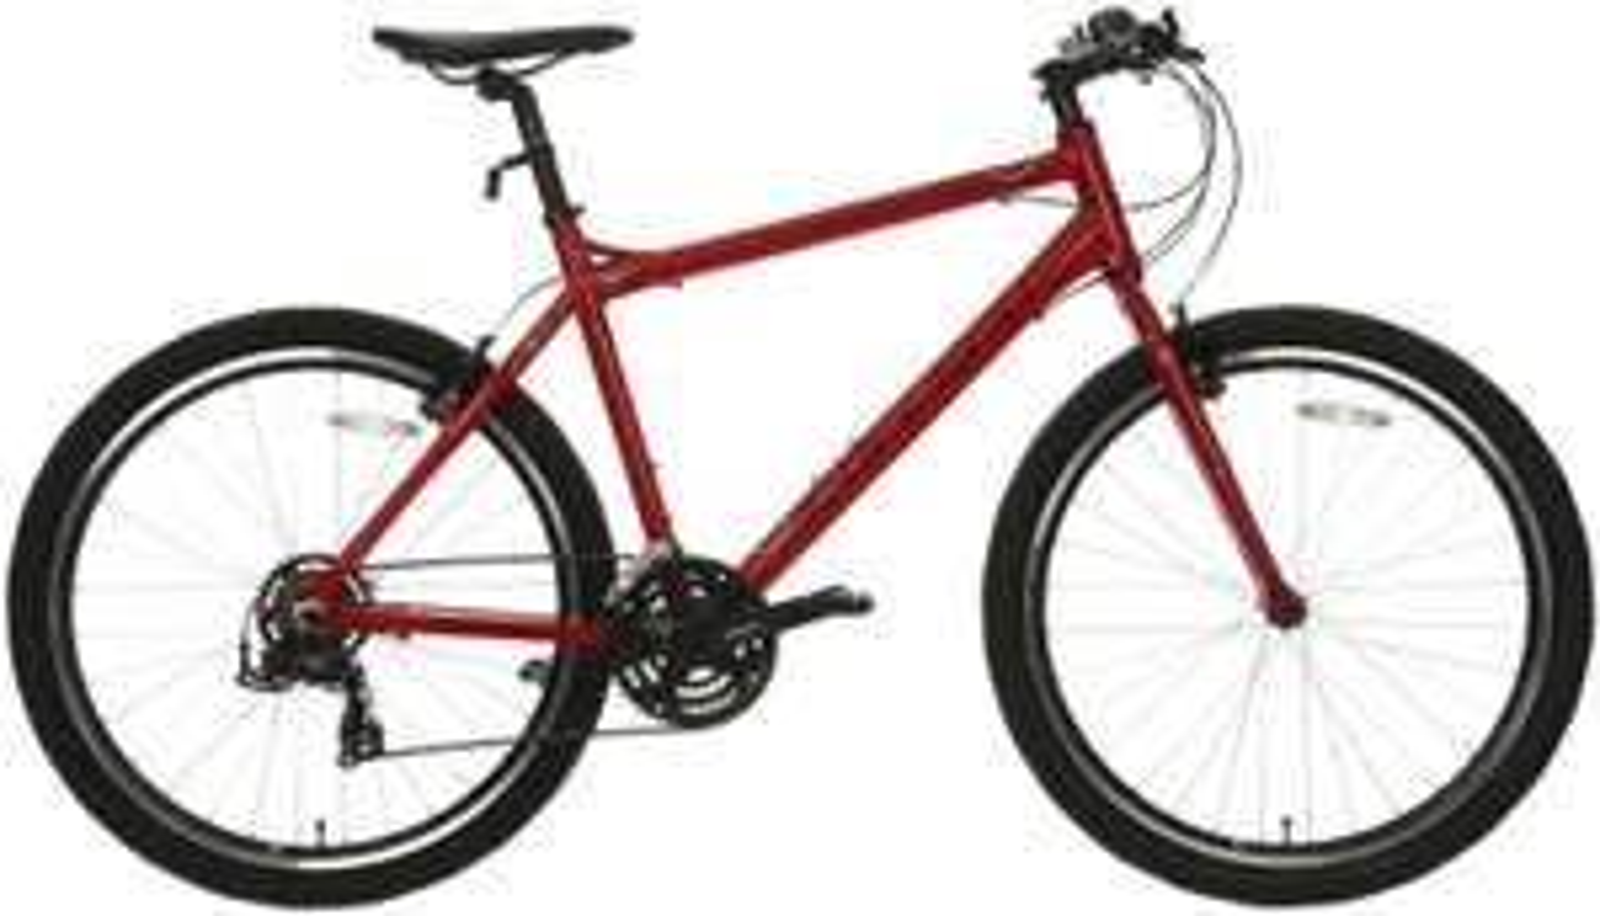 "Carrera Axle Mens Hybrid Bike Bicycle Red 27.5"" Aluminium wheels 21 Speed, £180 from Halfords"